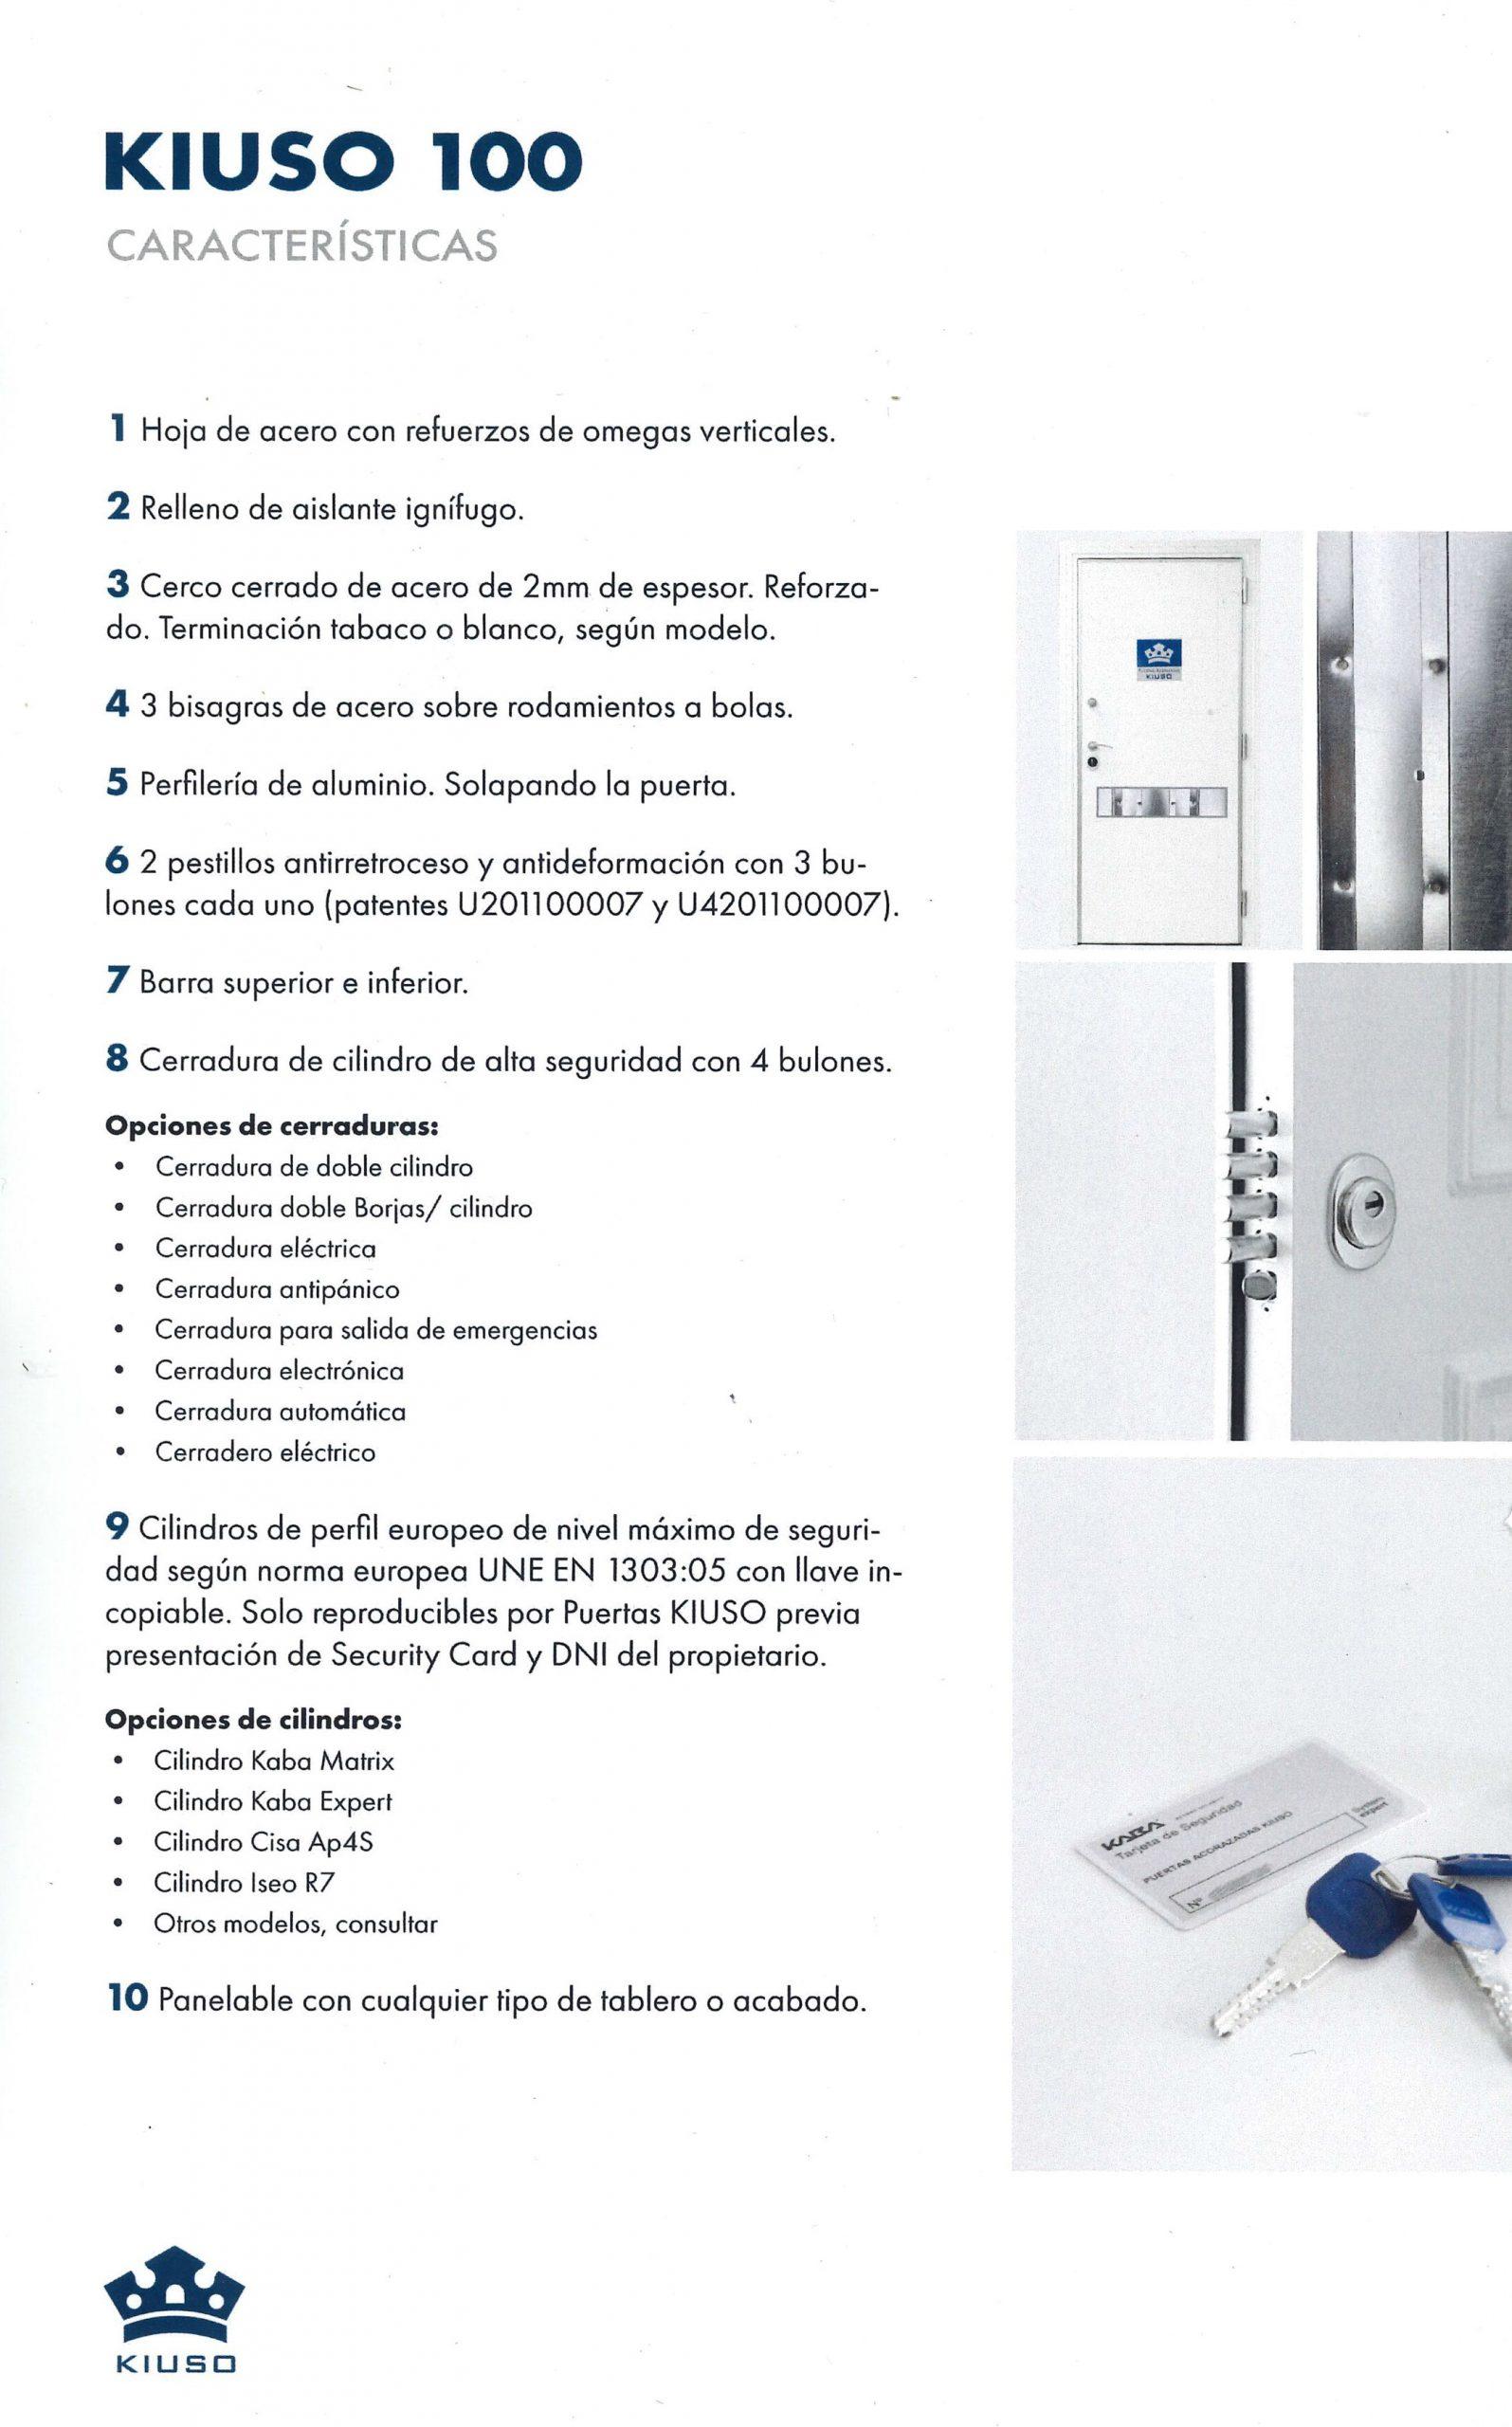 caracteristicas-puerta-kiuso-100-2